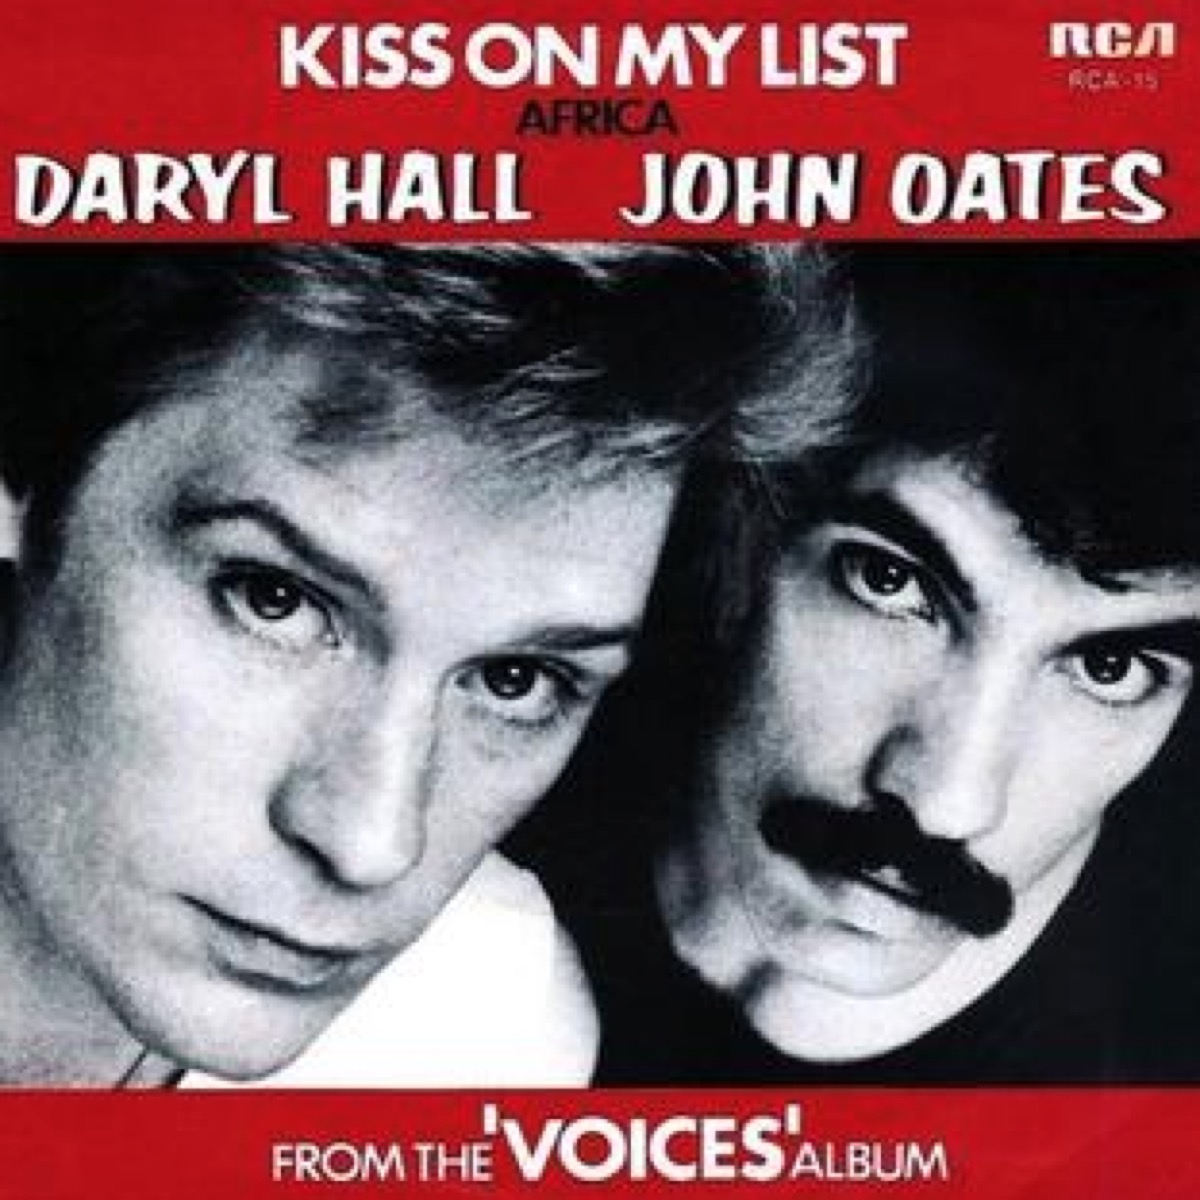 """kiss on my list"" song"